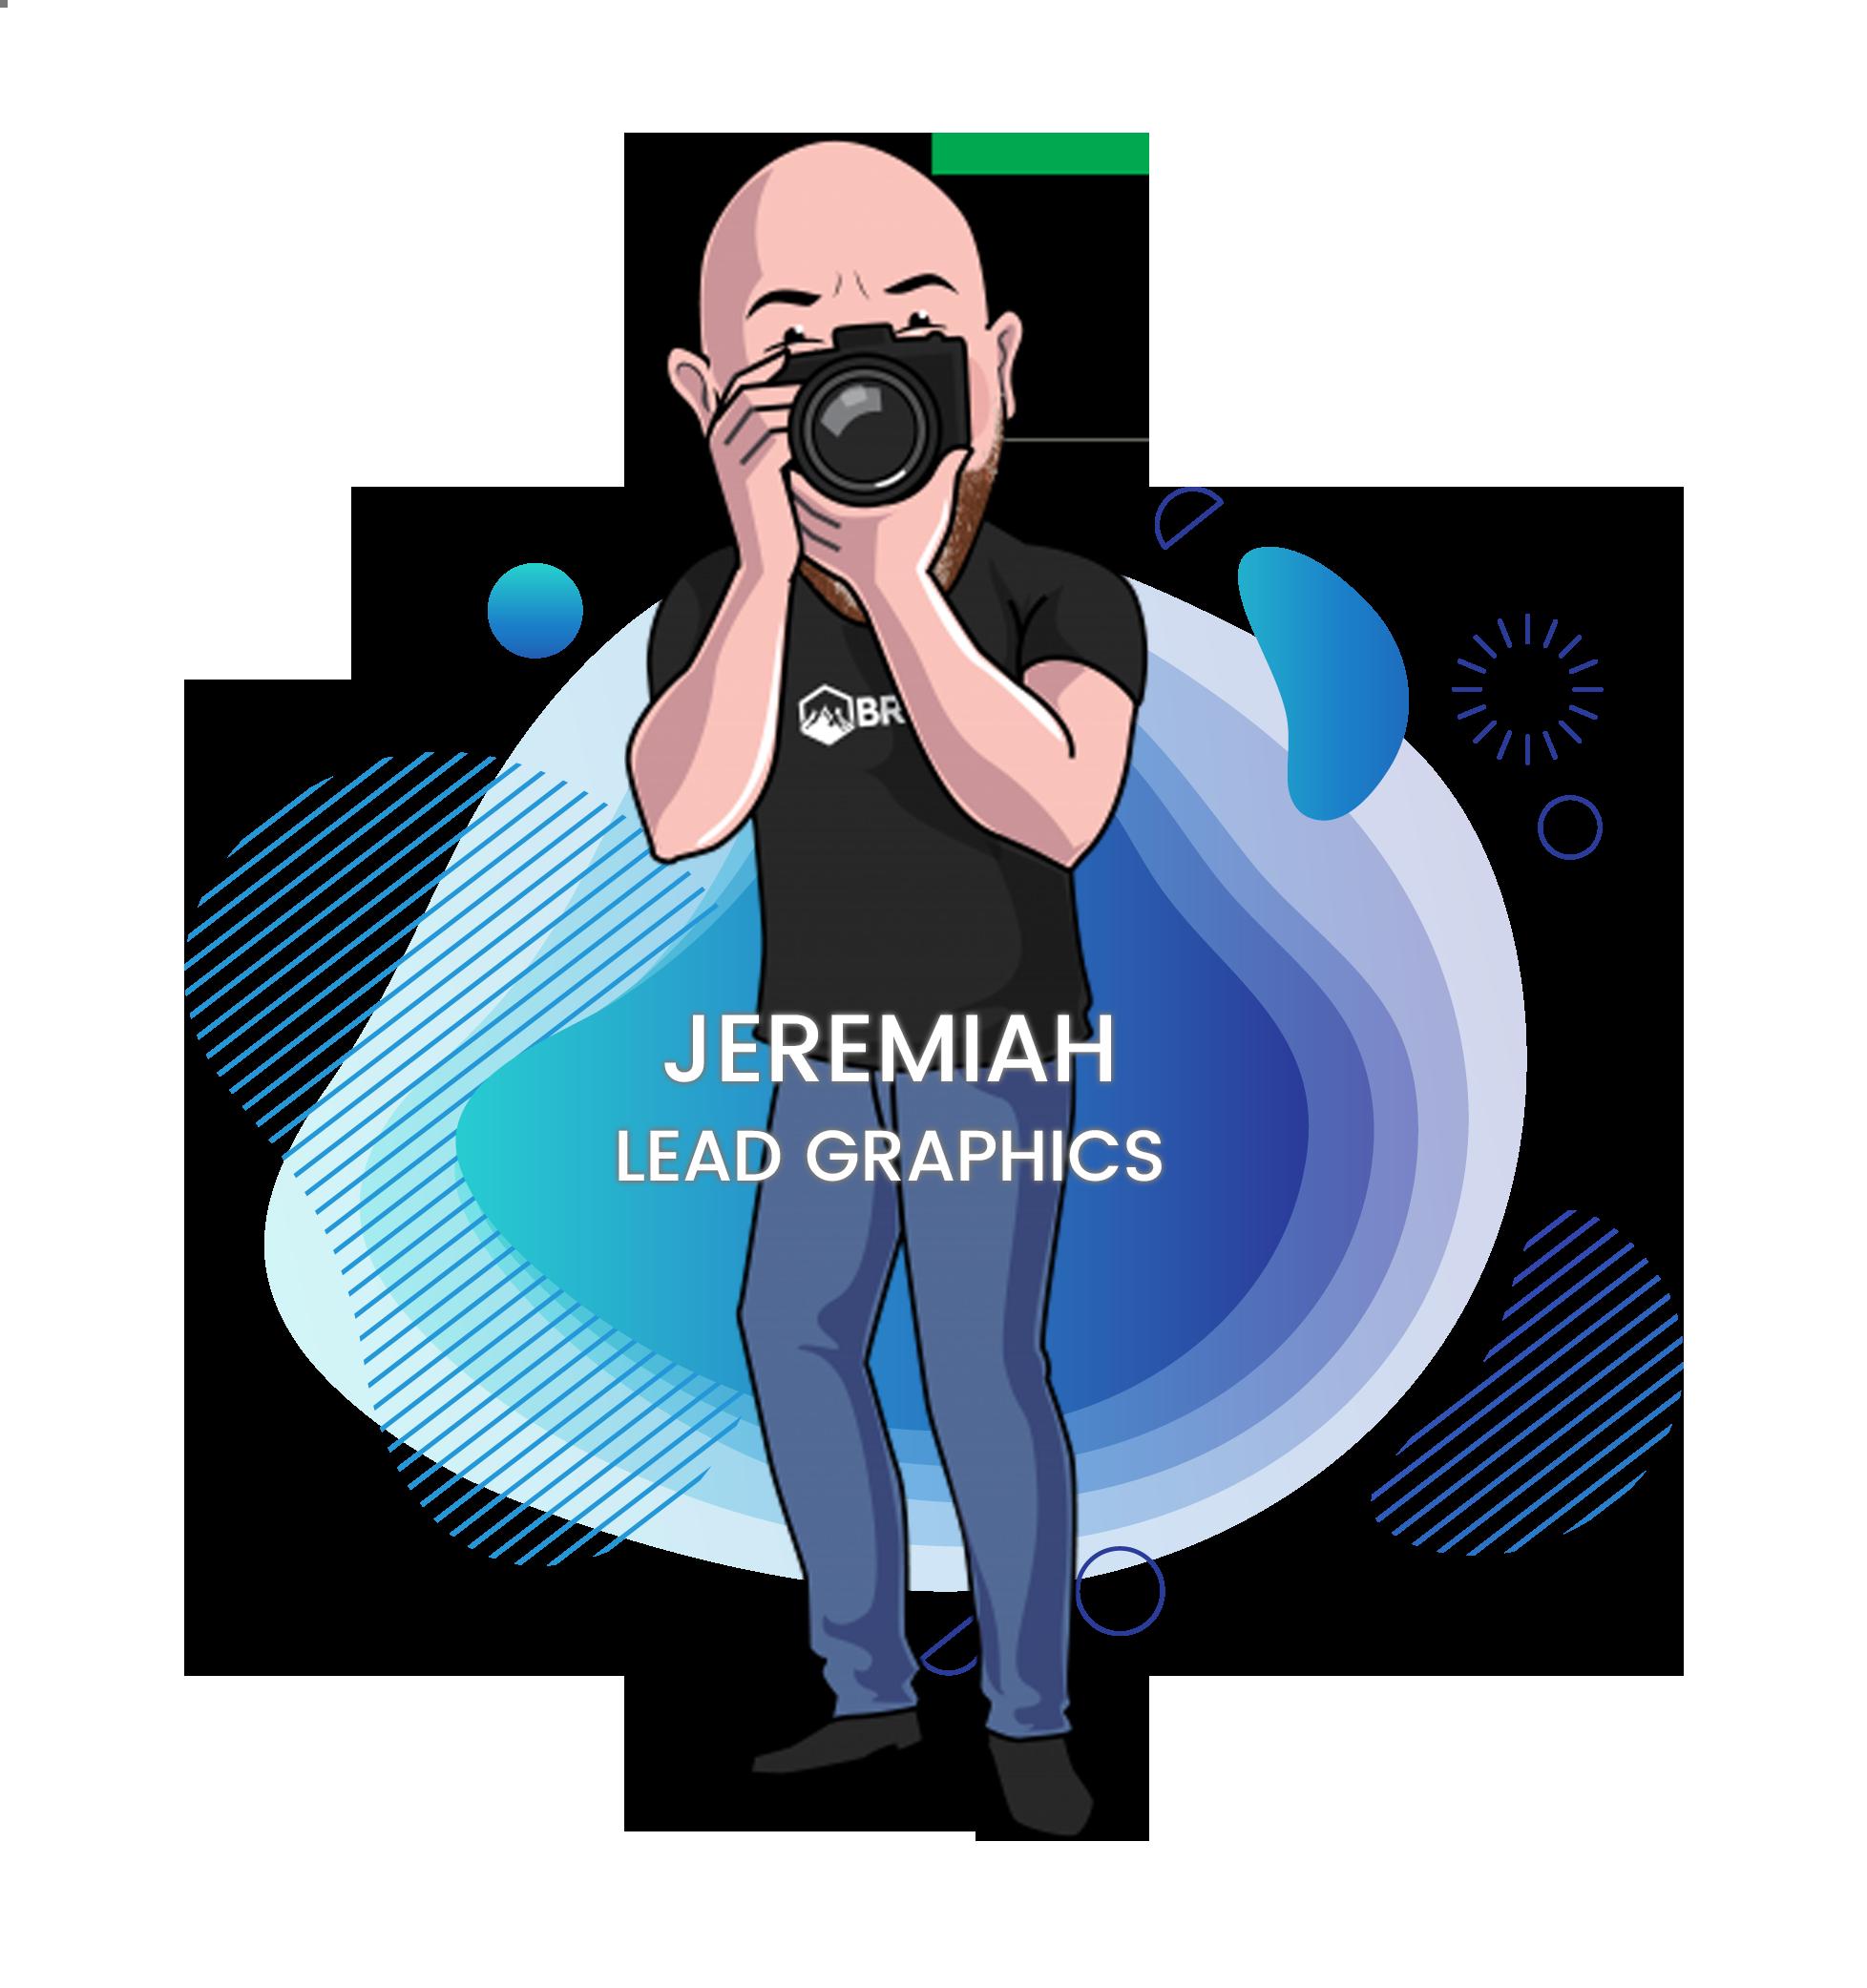 Jeremiah Lead Graphics